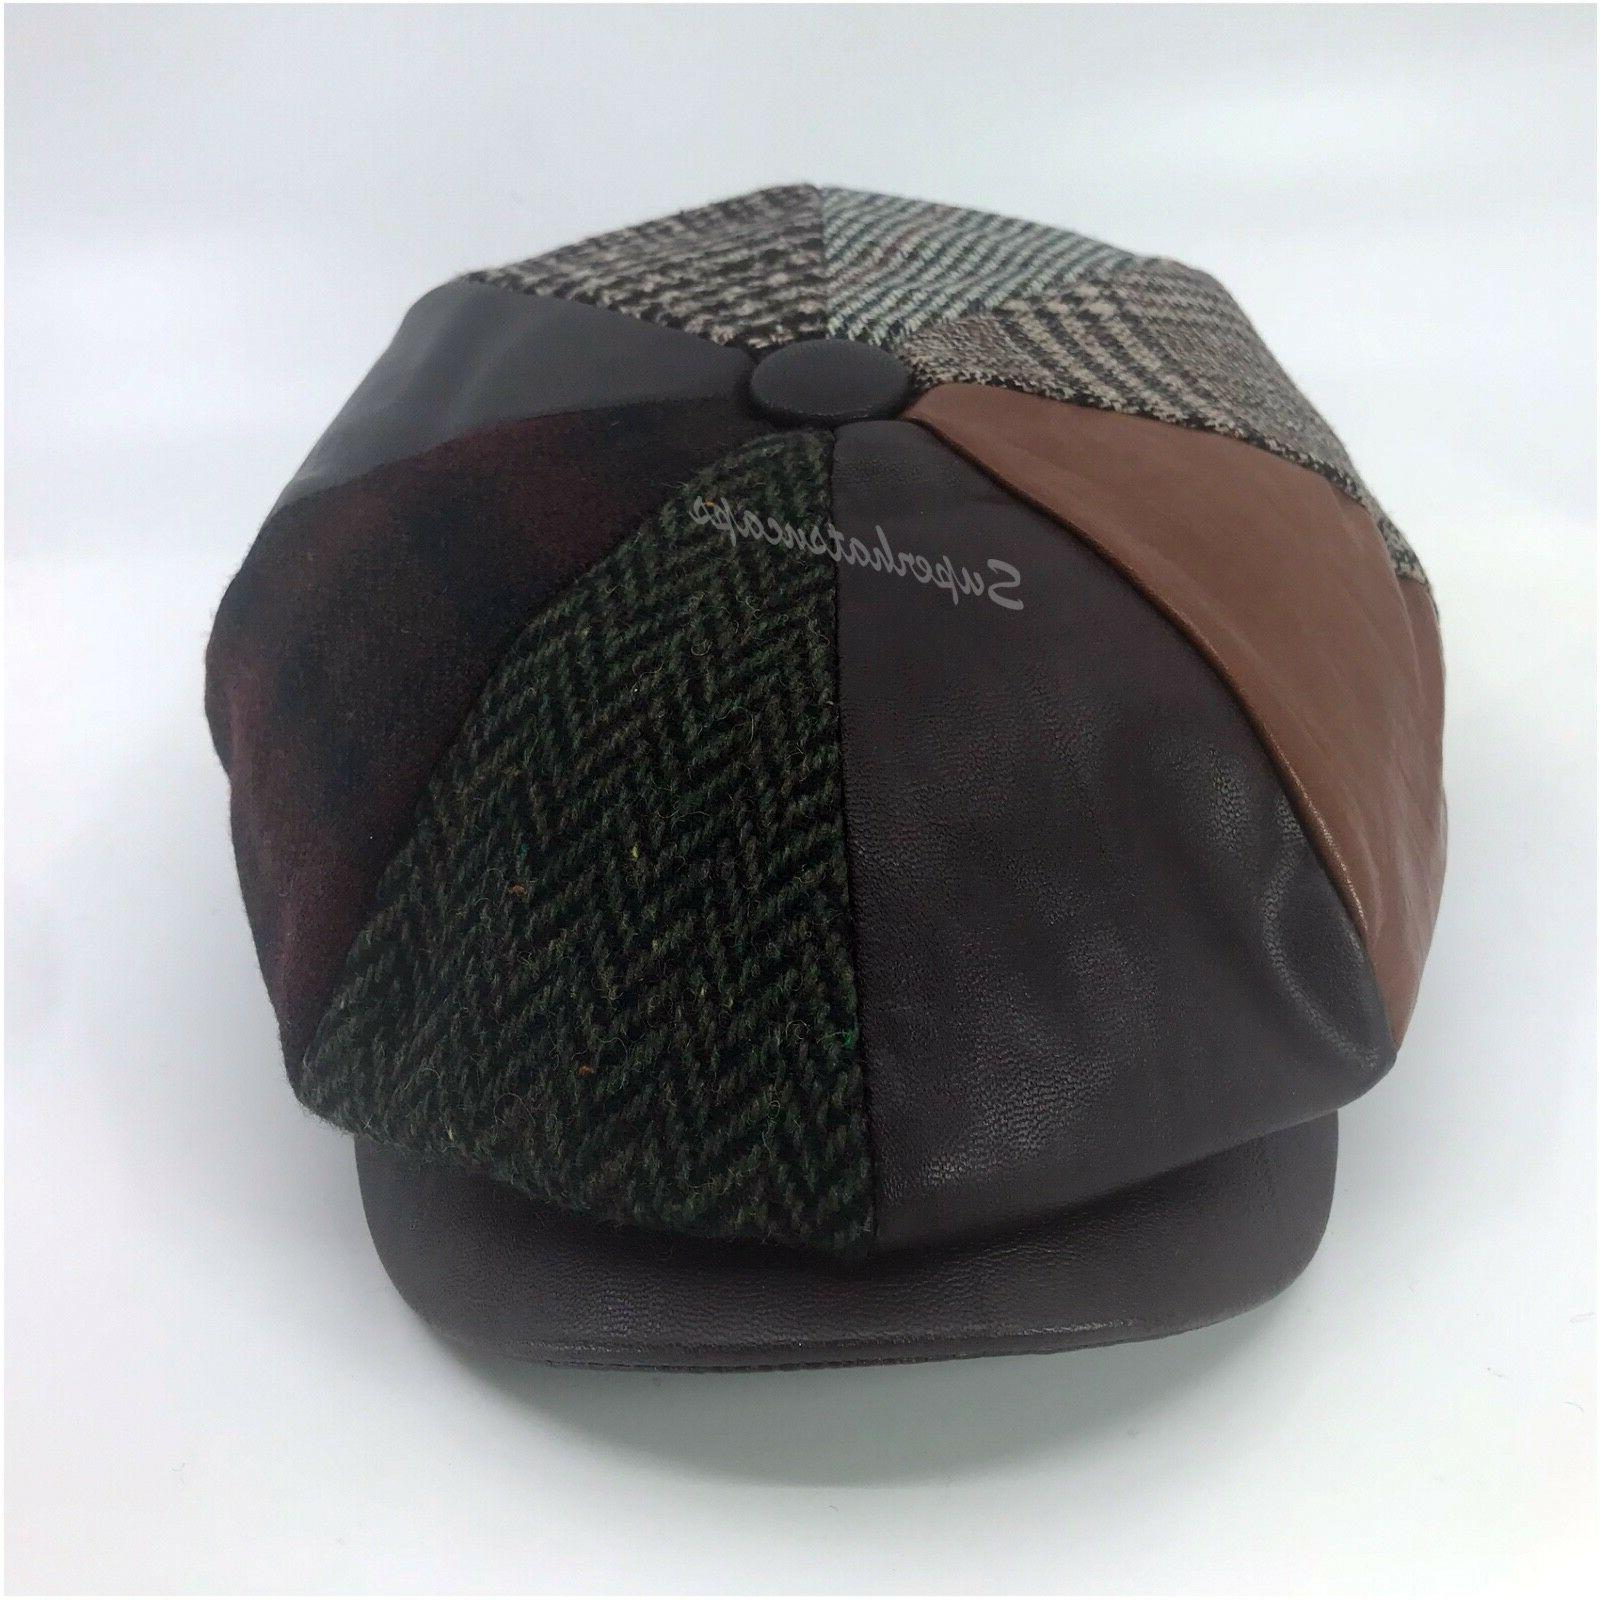 Men's Cabbie Apple Jack Ascot Hat